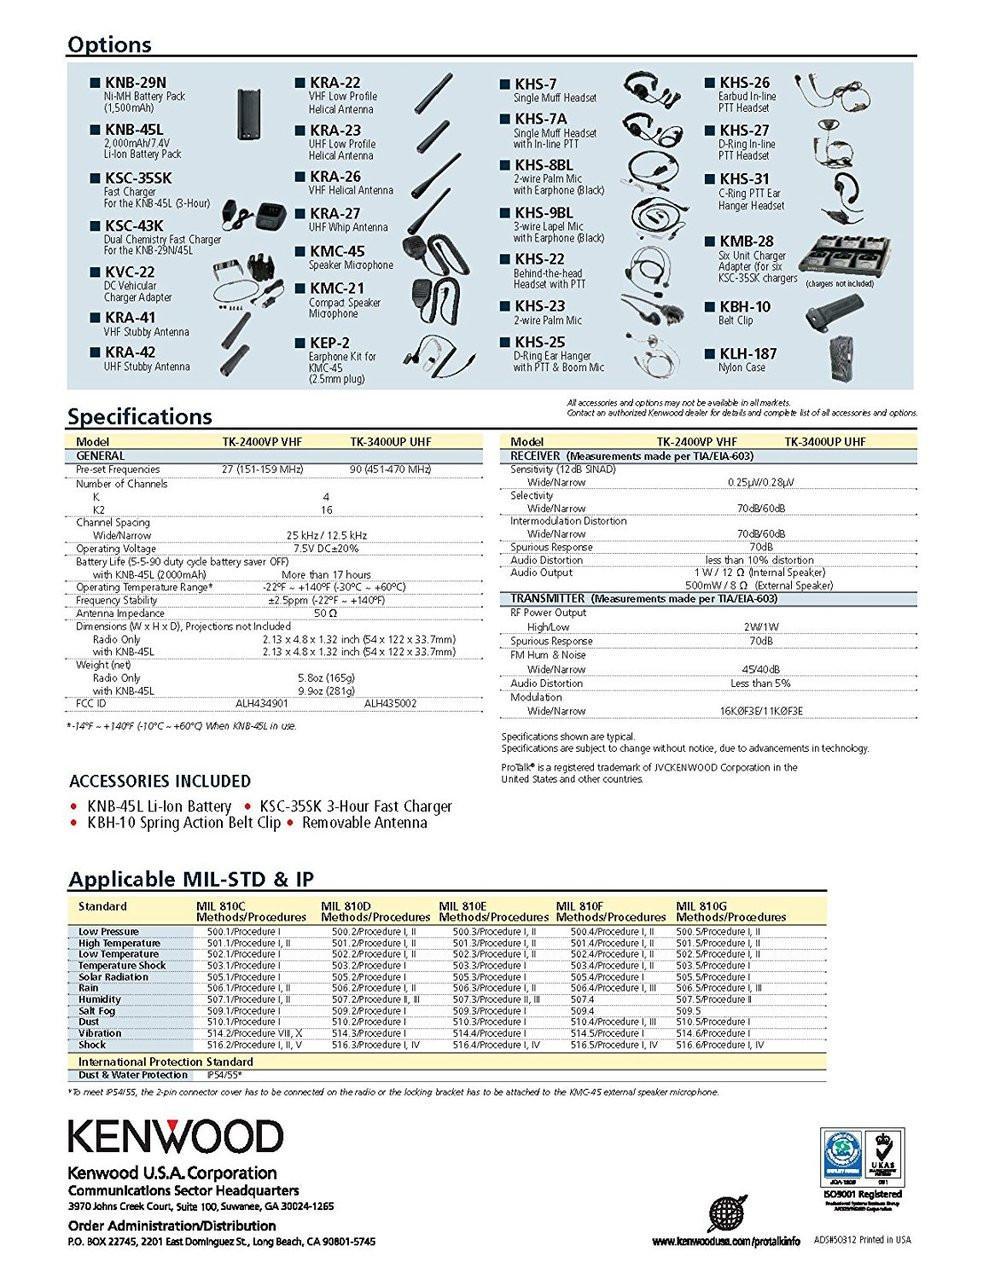 Kenwood ProTalk TK3400U16P 2 Watt 16 Channel UHF Two Way Radio Spec Sheet Page 2 of 2